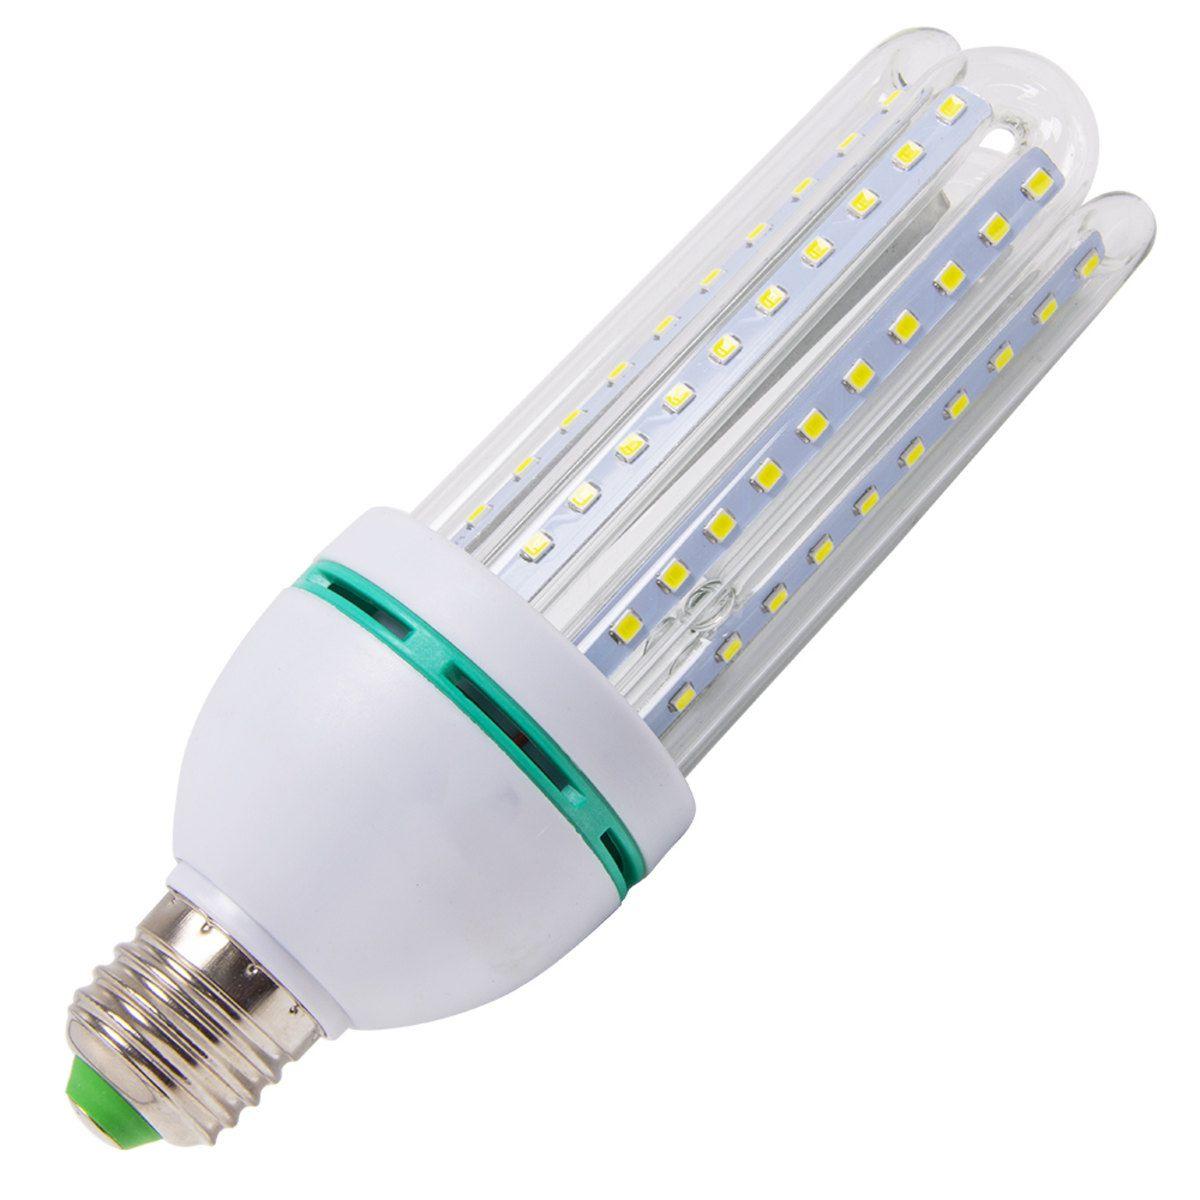 Lampada Led Milho 16W 6500k Luz Branca Bivolt Asus